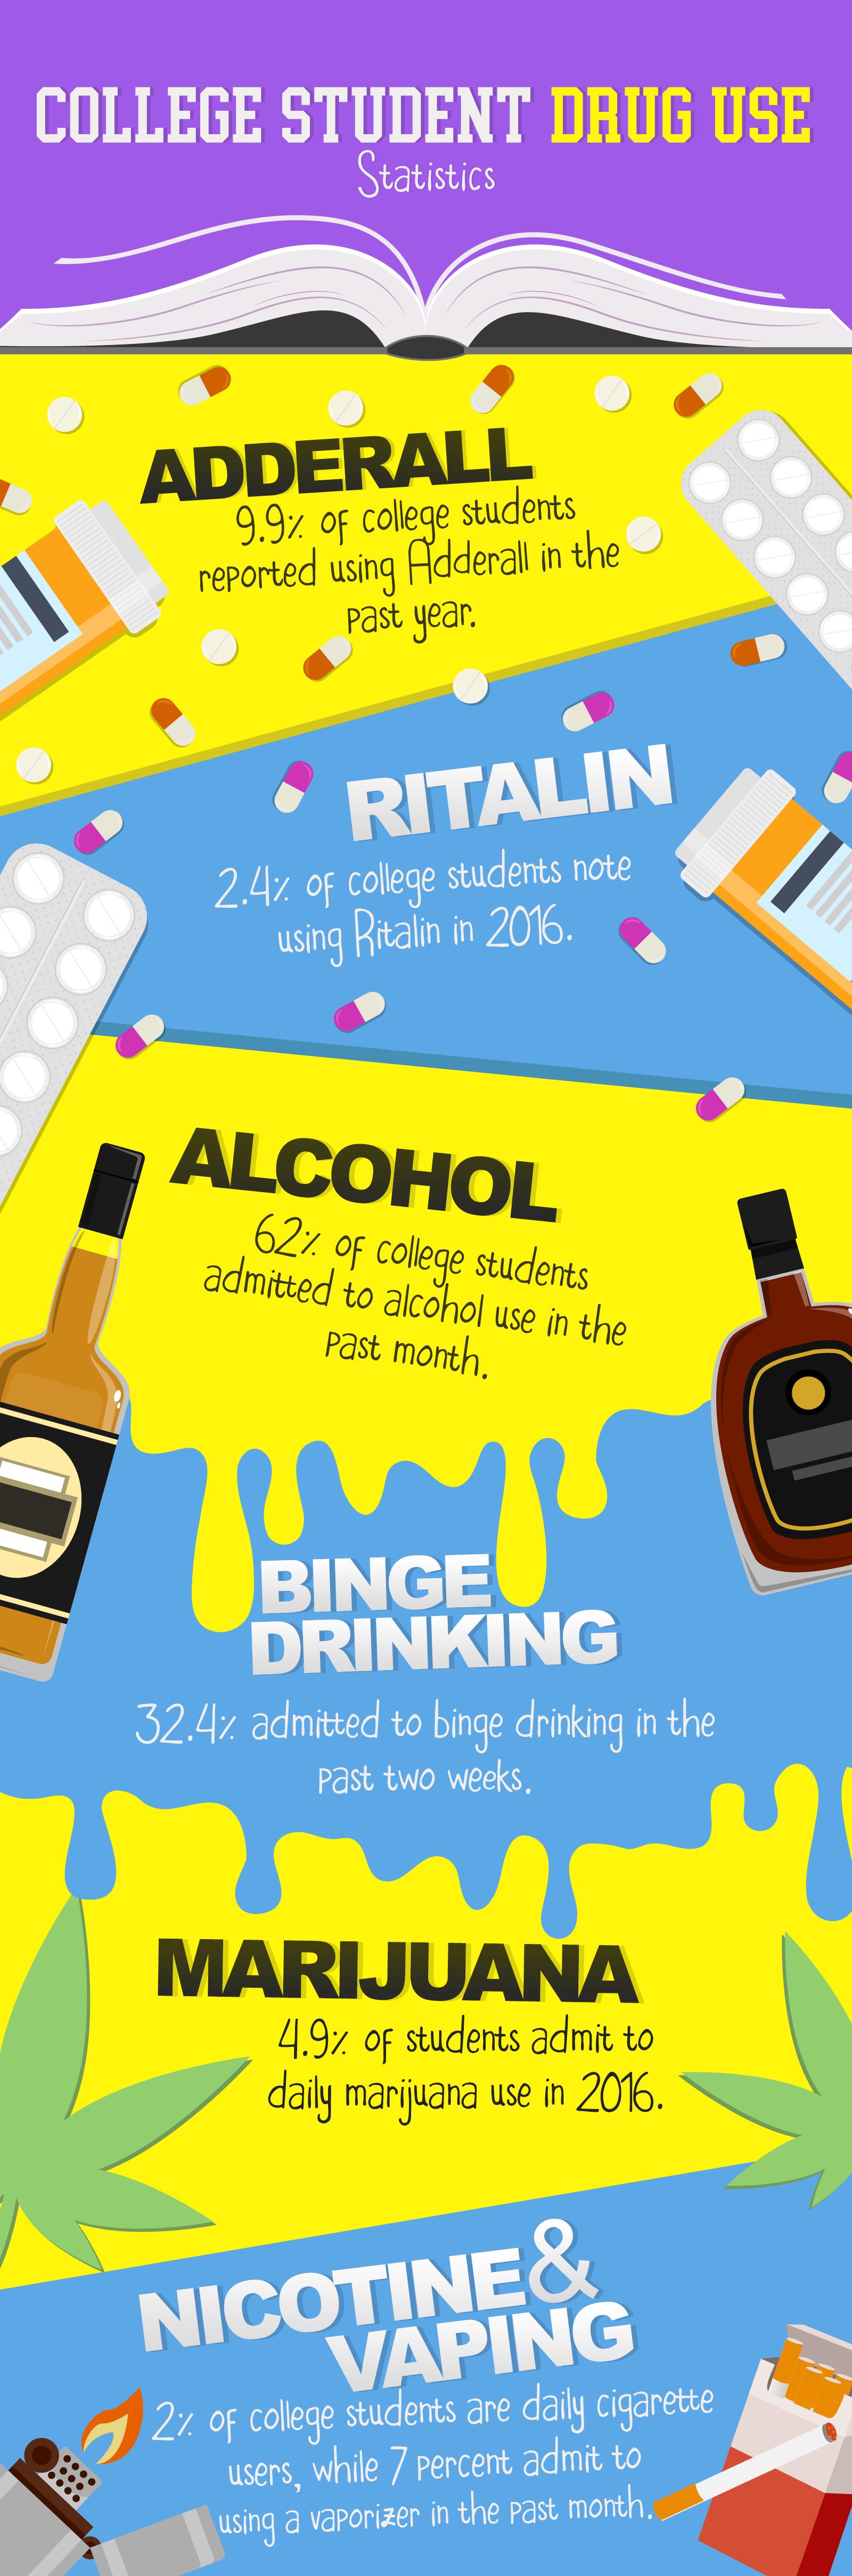 College Student Drug Use Statistics